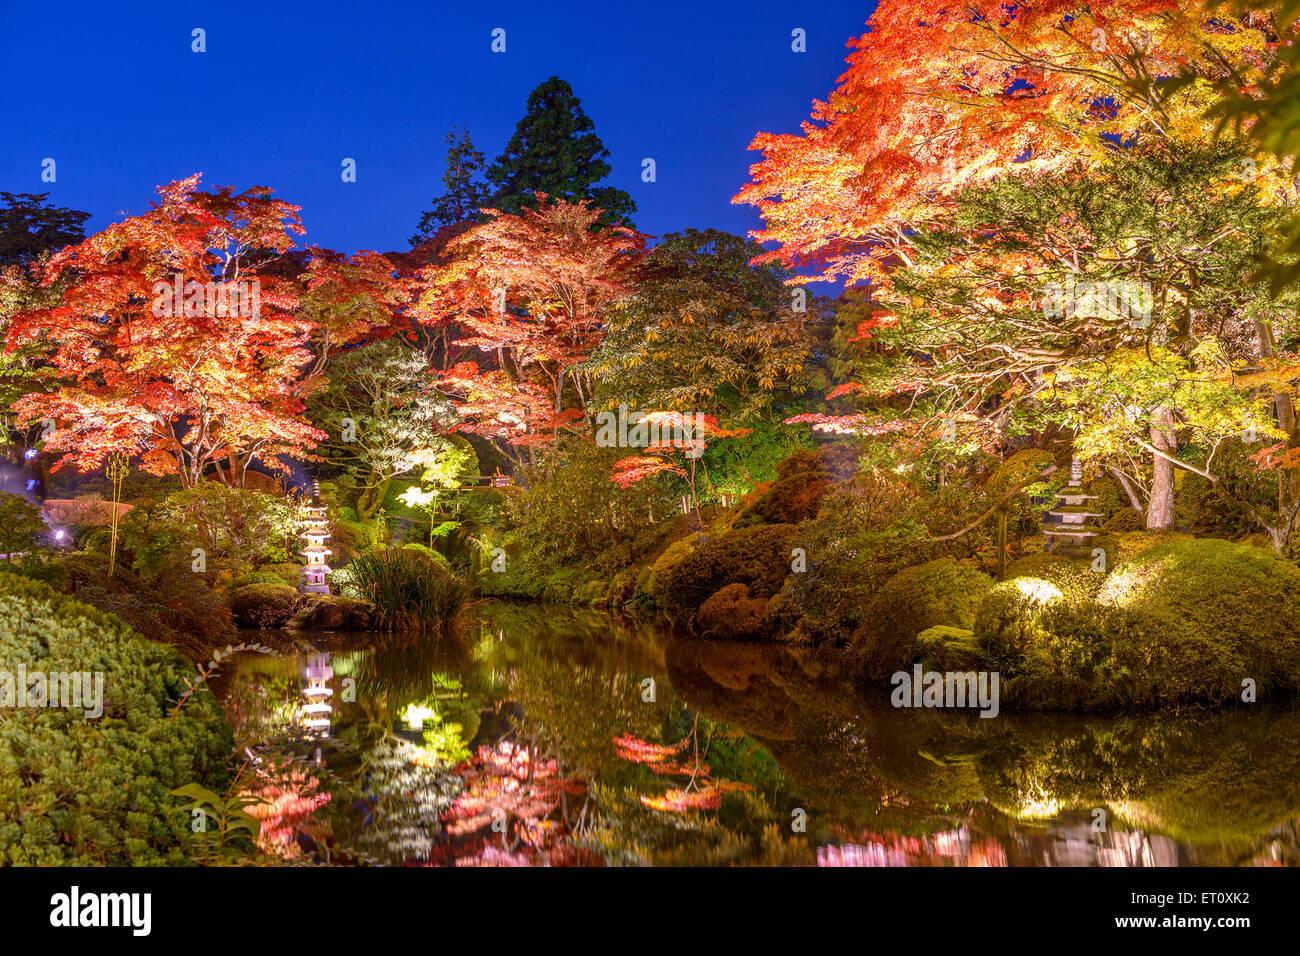 Nikko, Japan im Shoyo-En Garden im Herbst. Stockbild